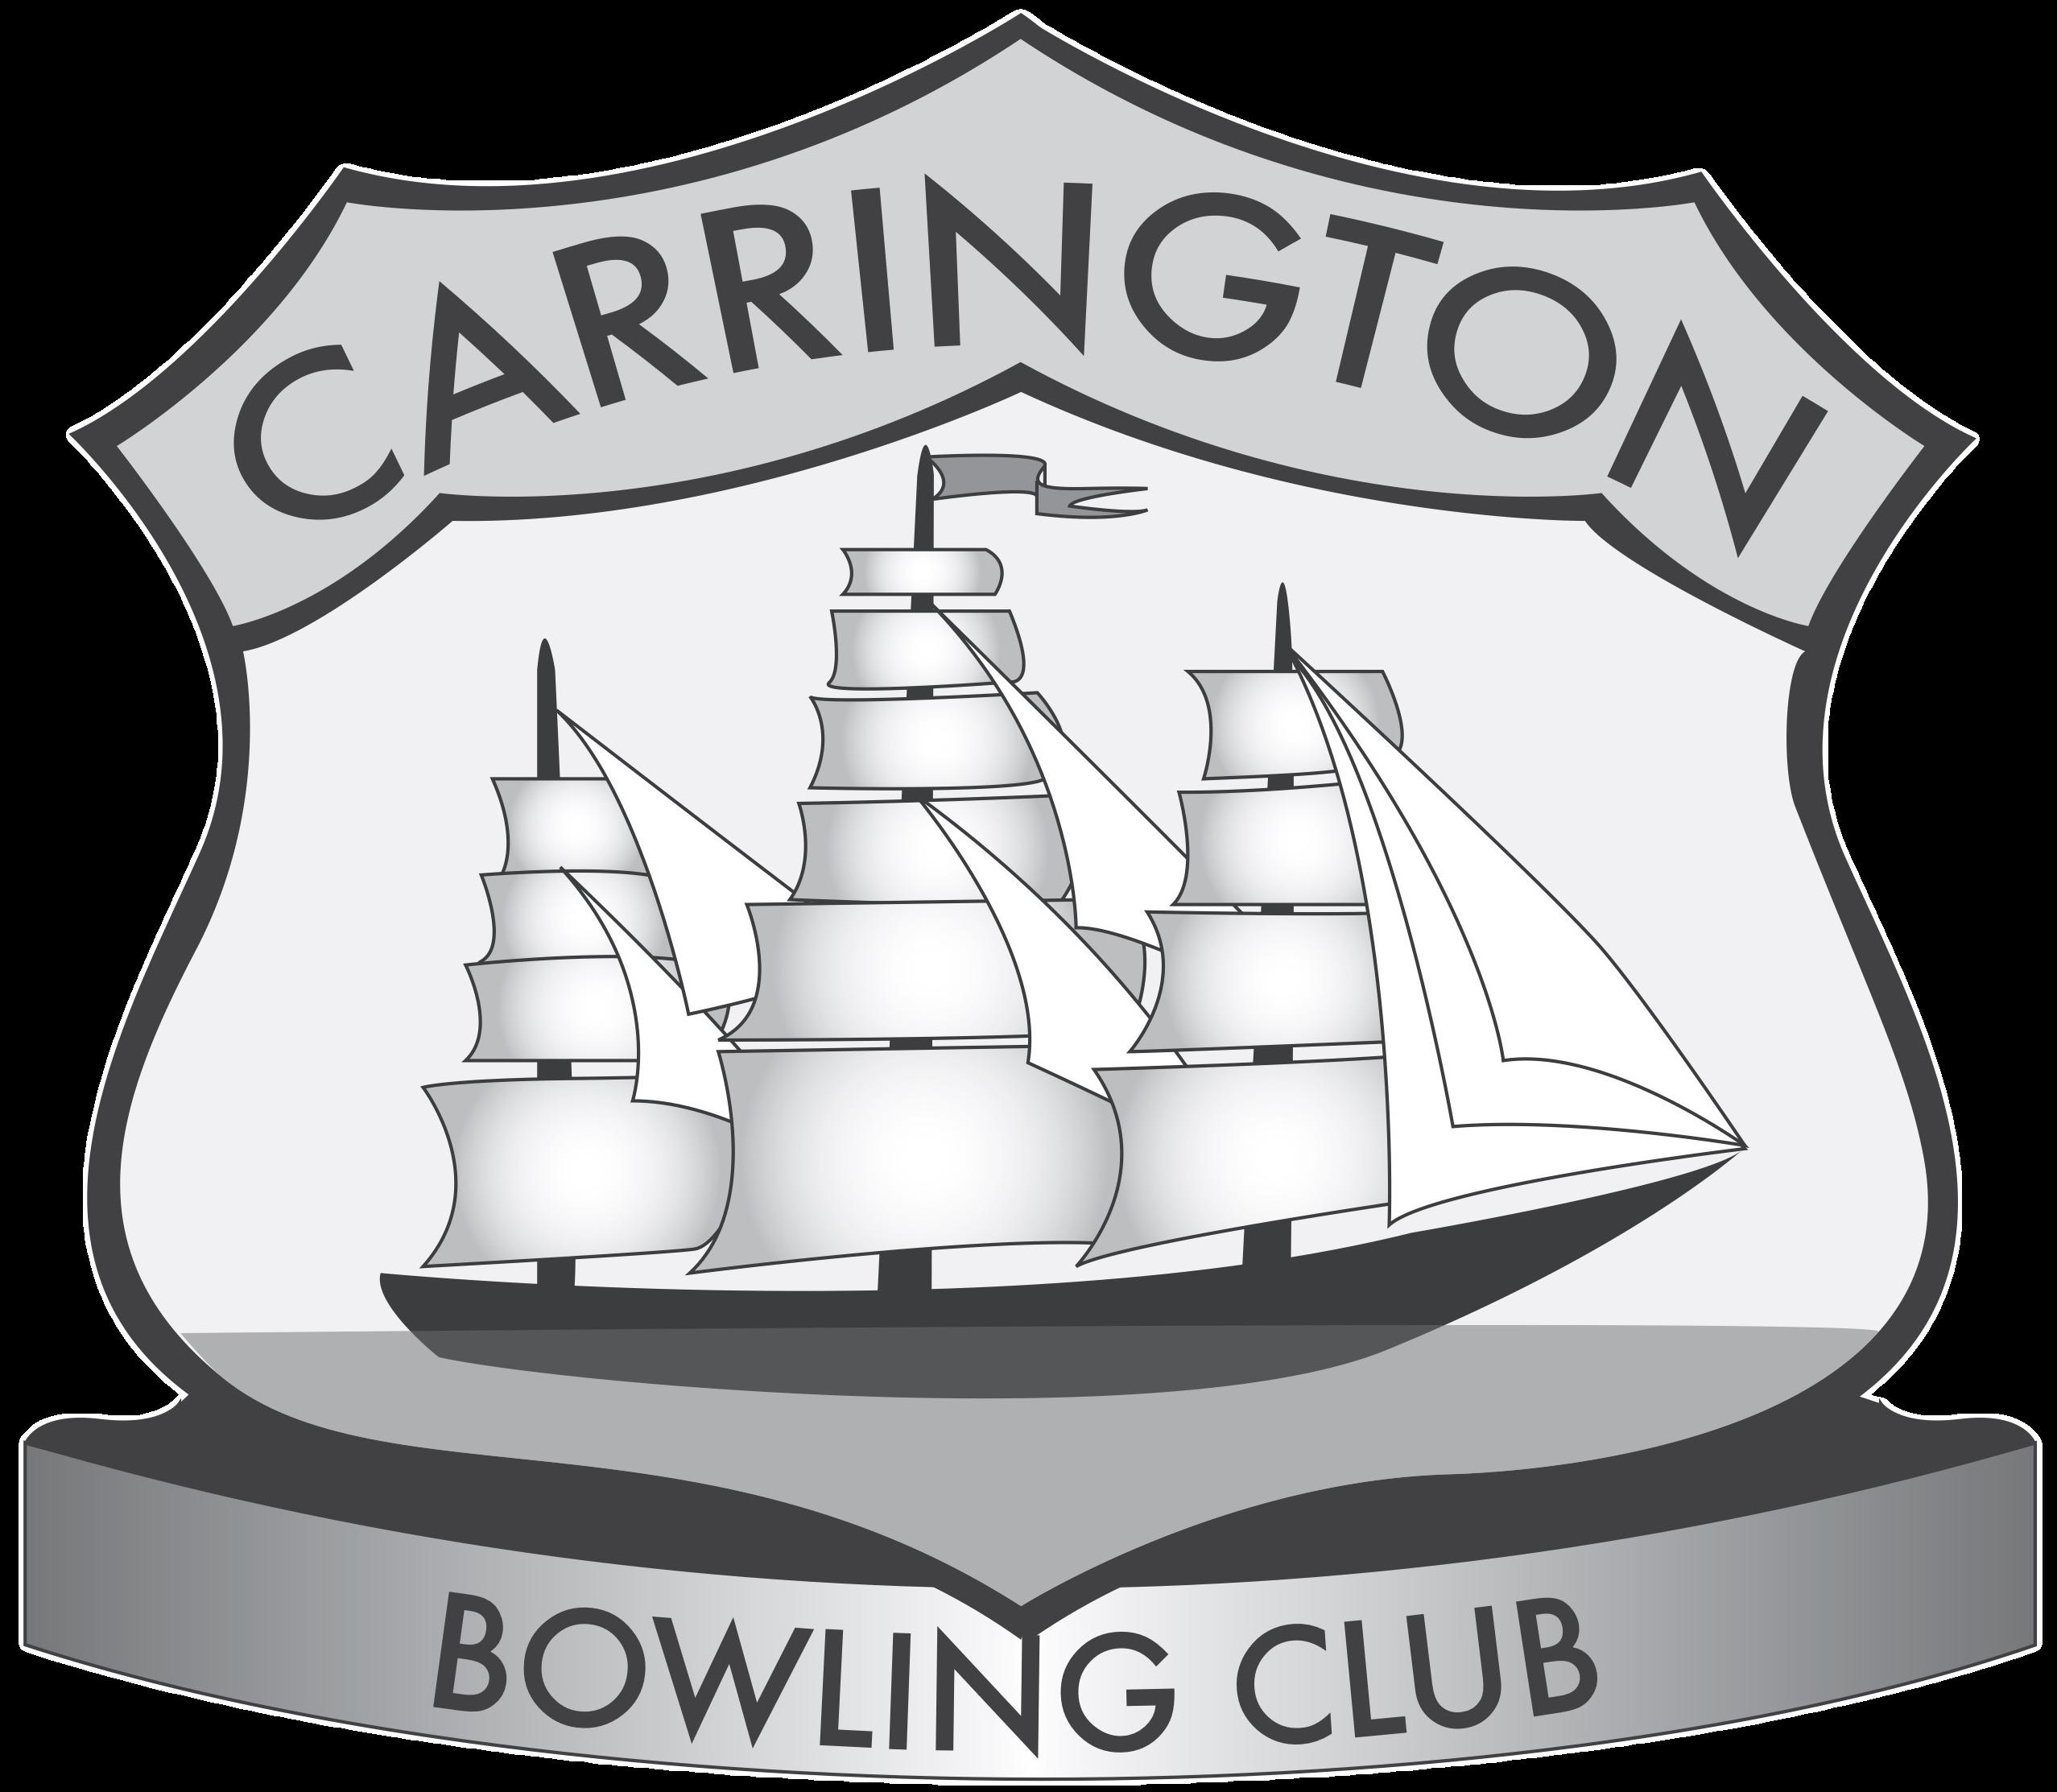 Carrington Bowling Club